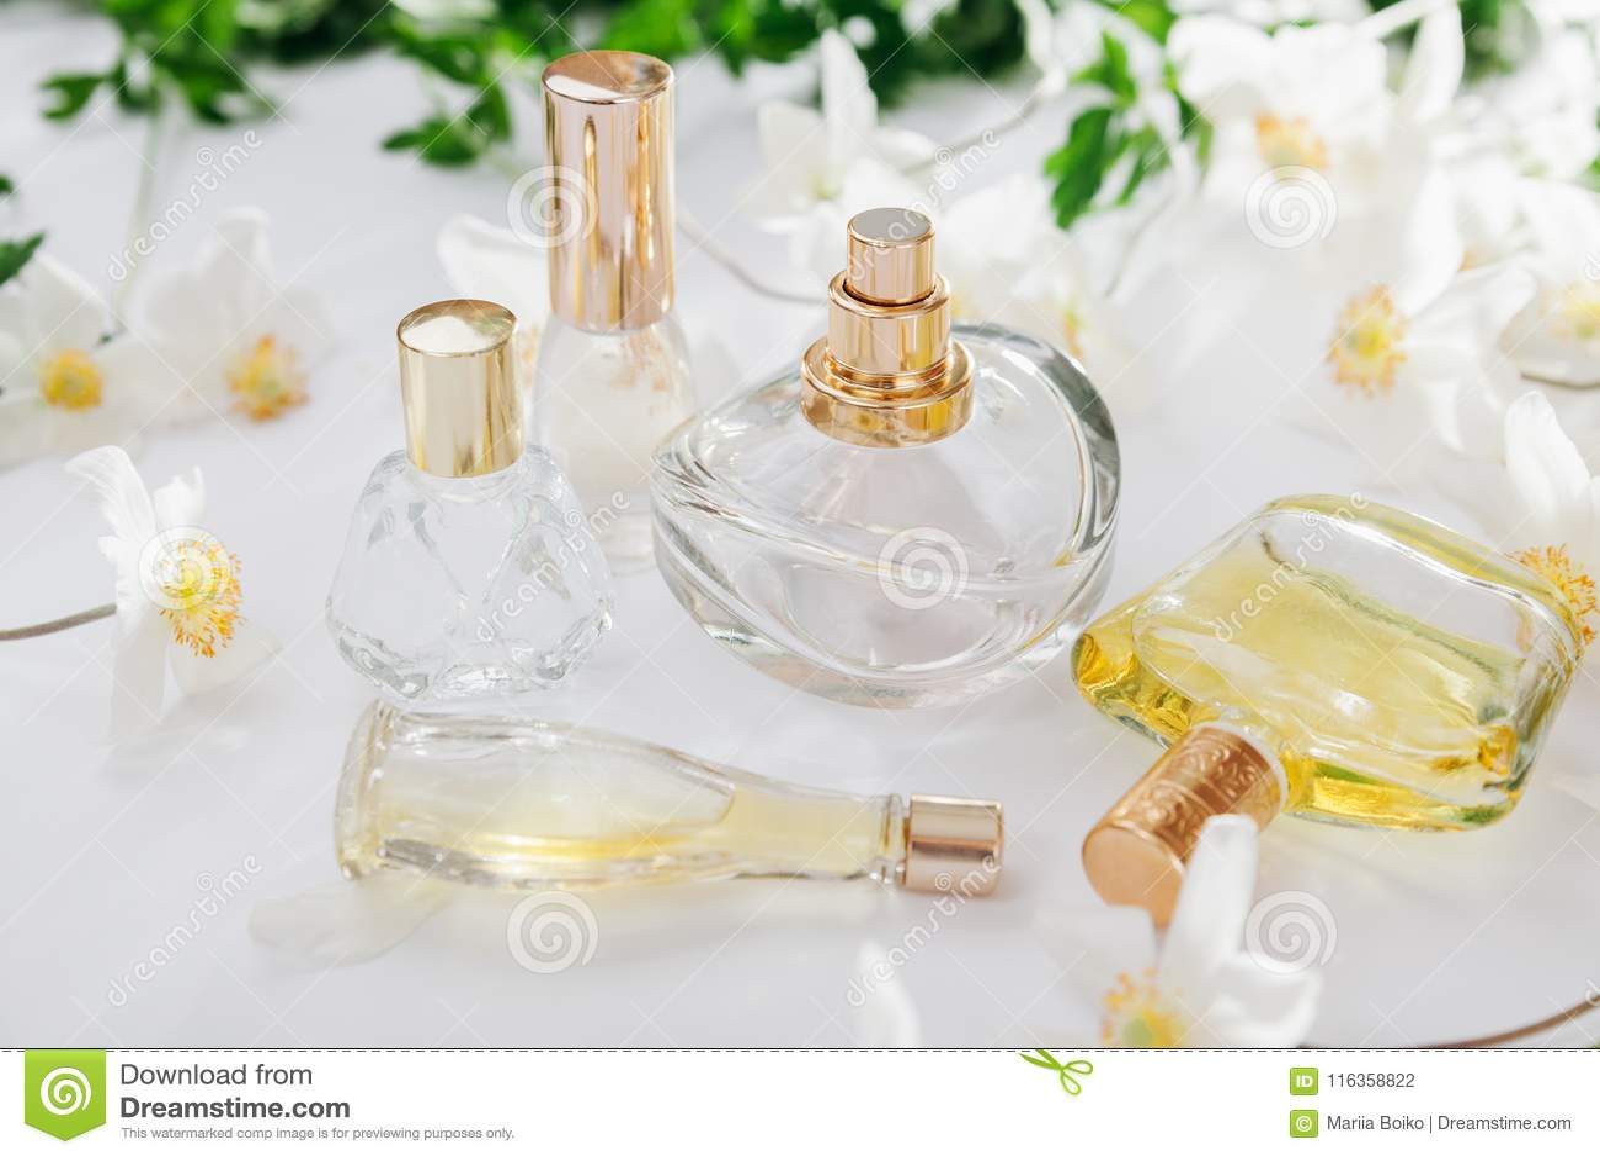 Natural perfume concept bottles of perfume with white flowers download natural perfume concept bottles of perfume with white flowers floral fragrance stock photo mightylinksfo